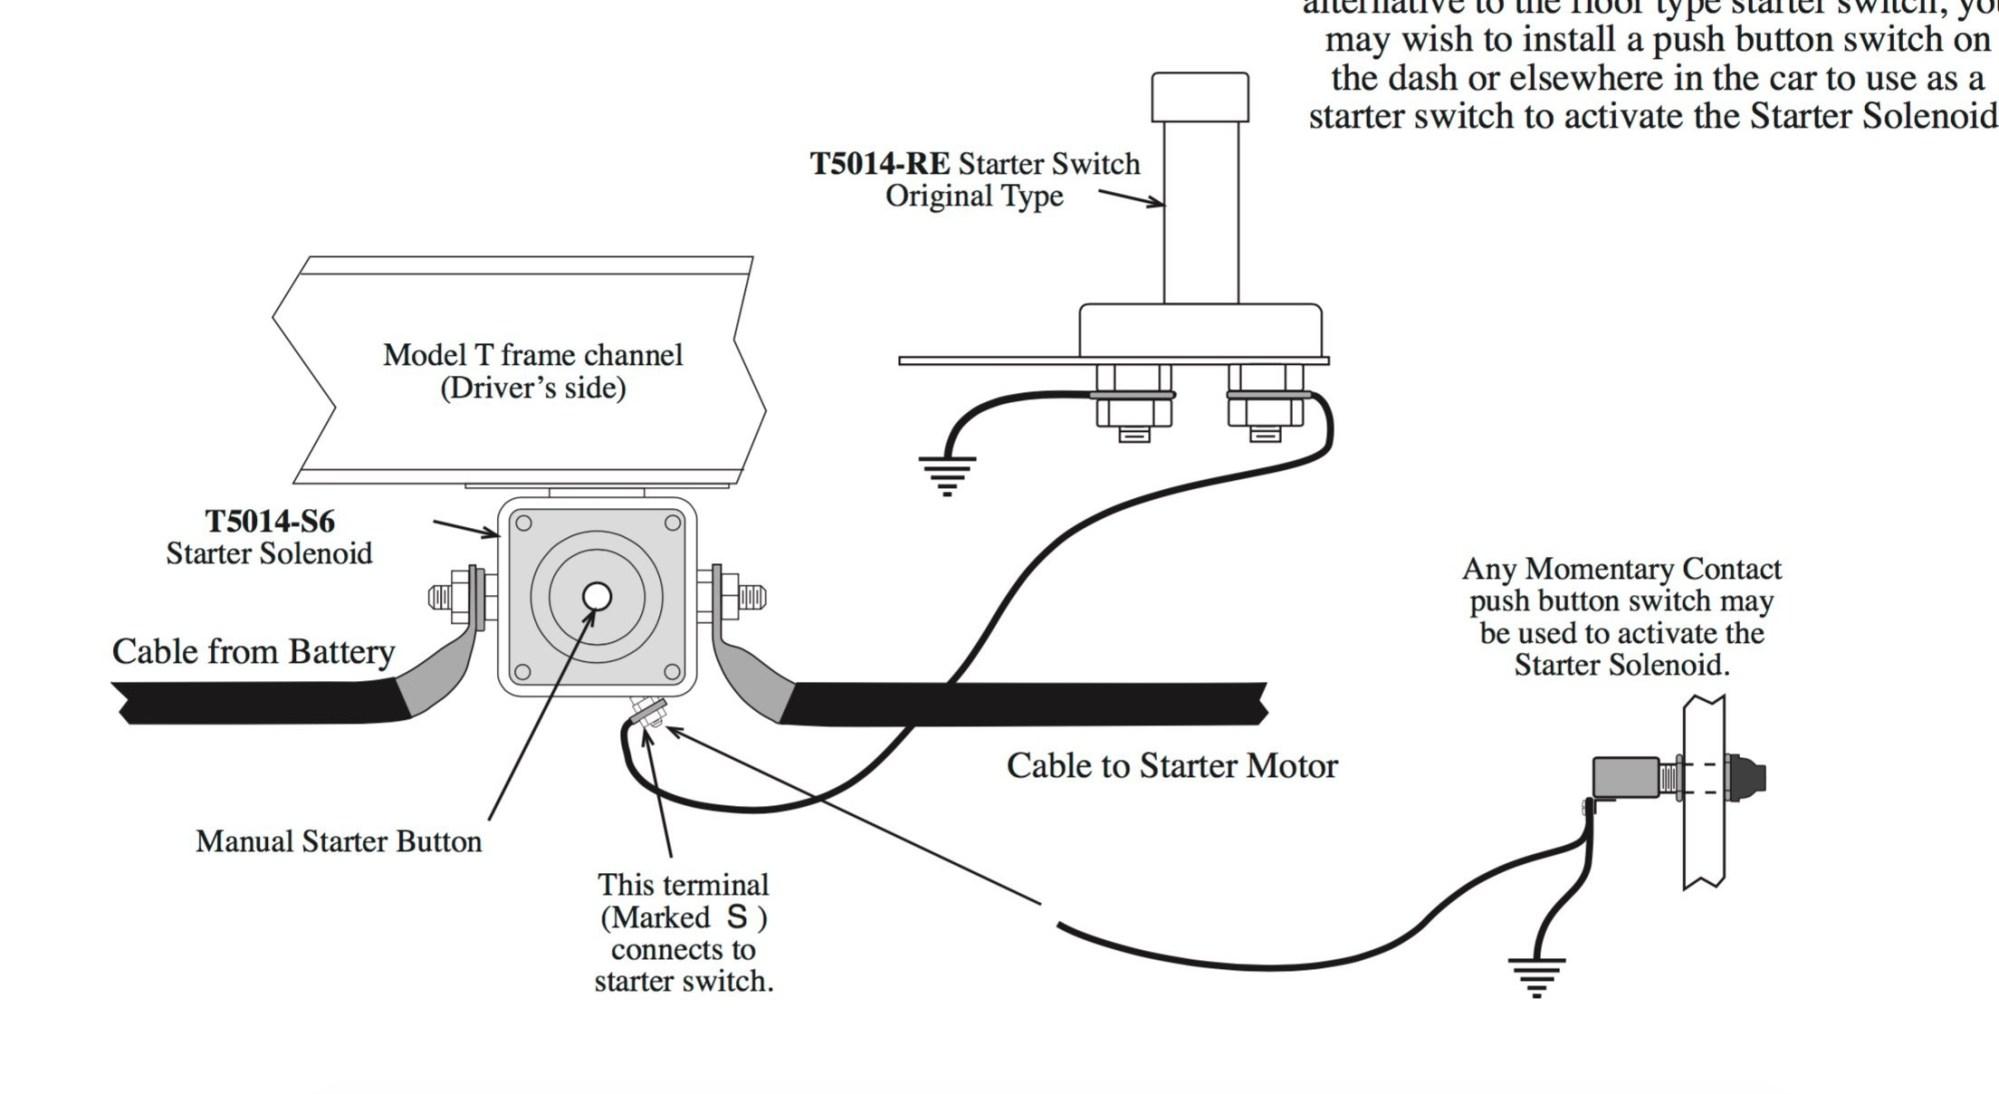 hight resolution of marine starter solenoid wiring diagram wiring diagram todays rh 13 7 12 1813weddingbarn com superwinch solenoid wiring diagram starter relay wiring diagram